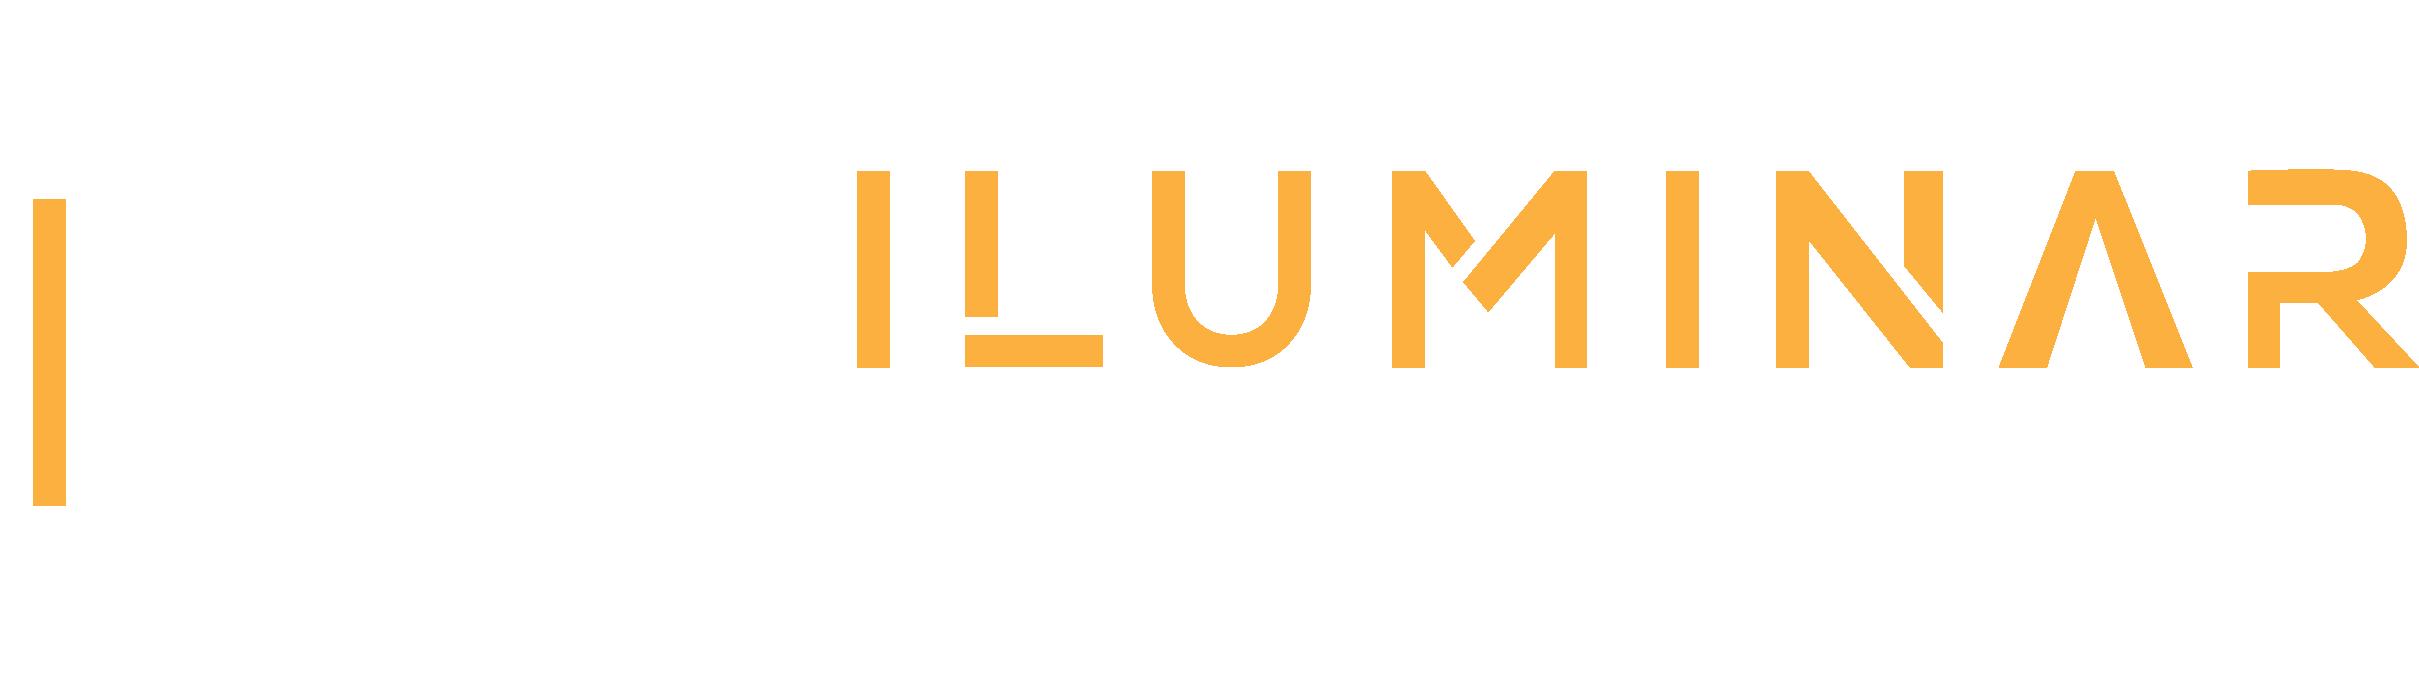 ILUMINAR ELECTRICAL SERVICES